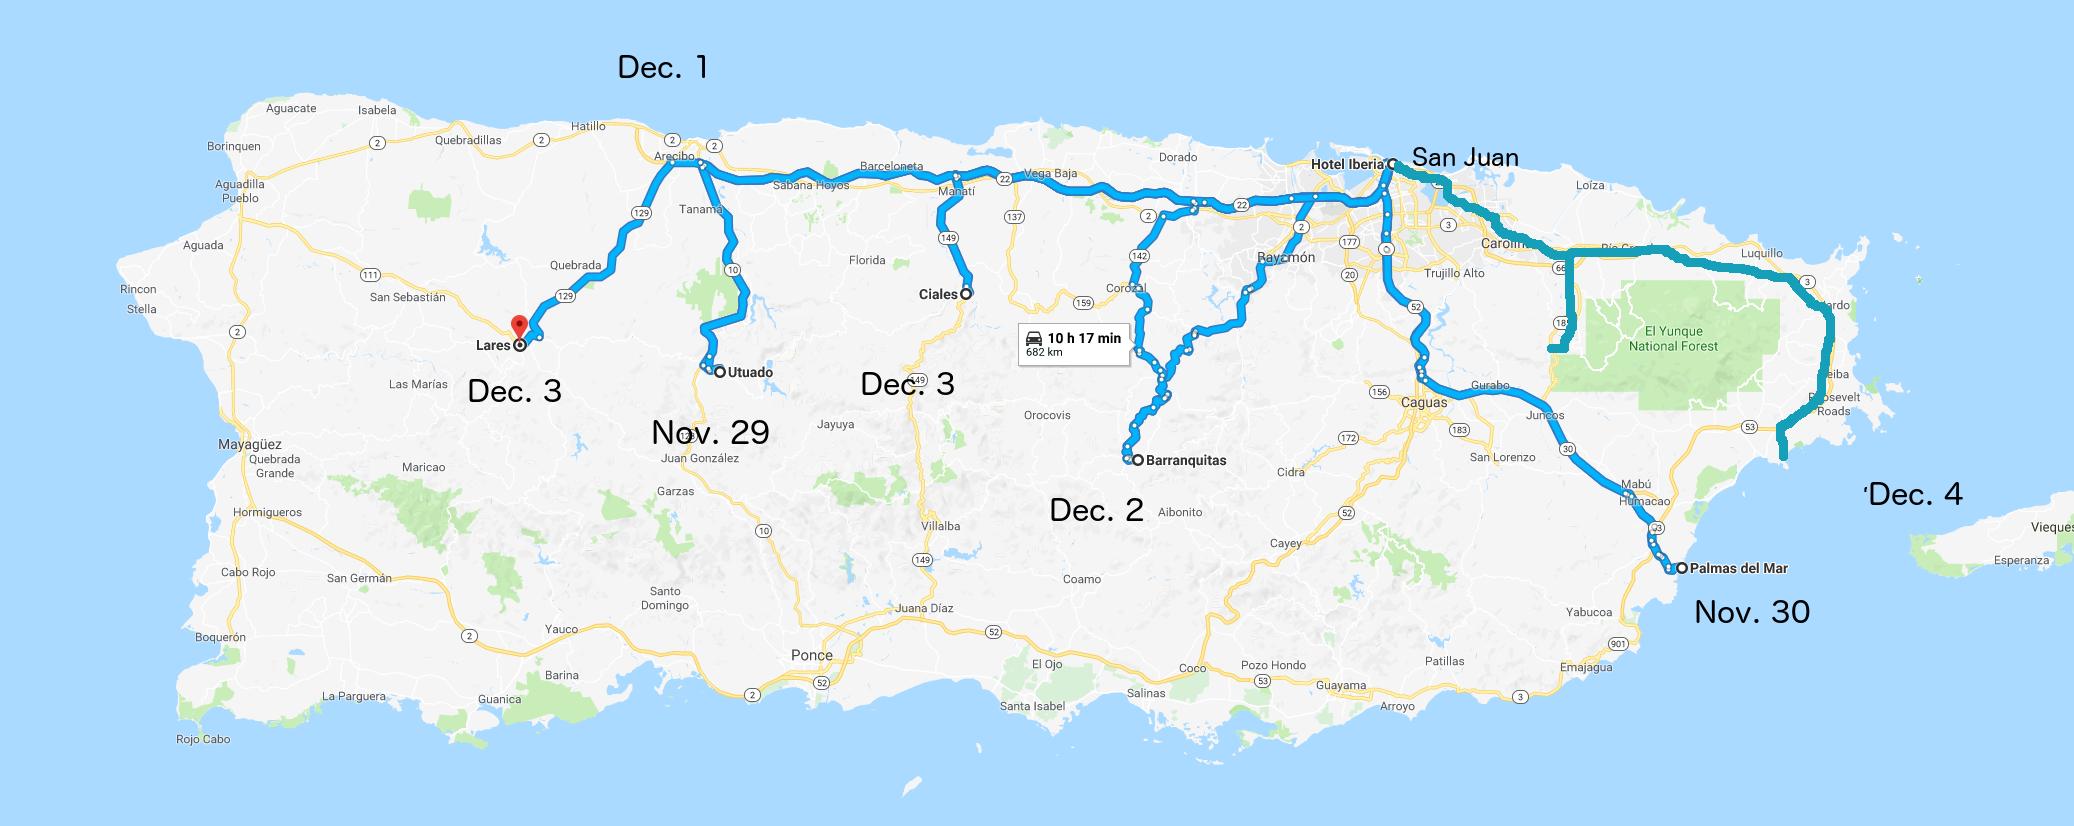 https://goo.gl/maps/oi4drP99b642